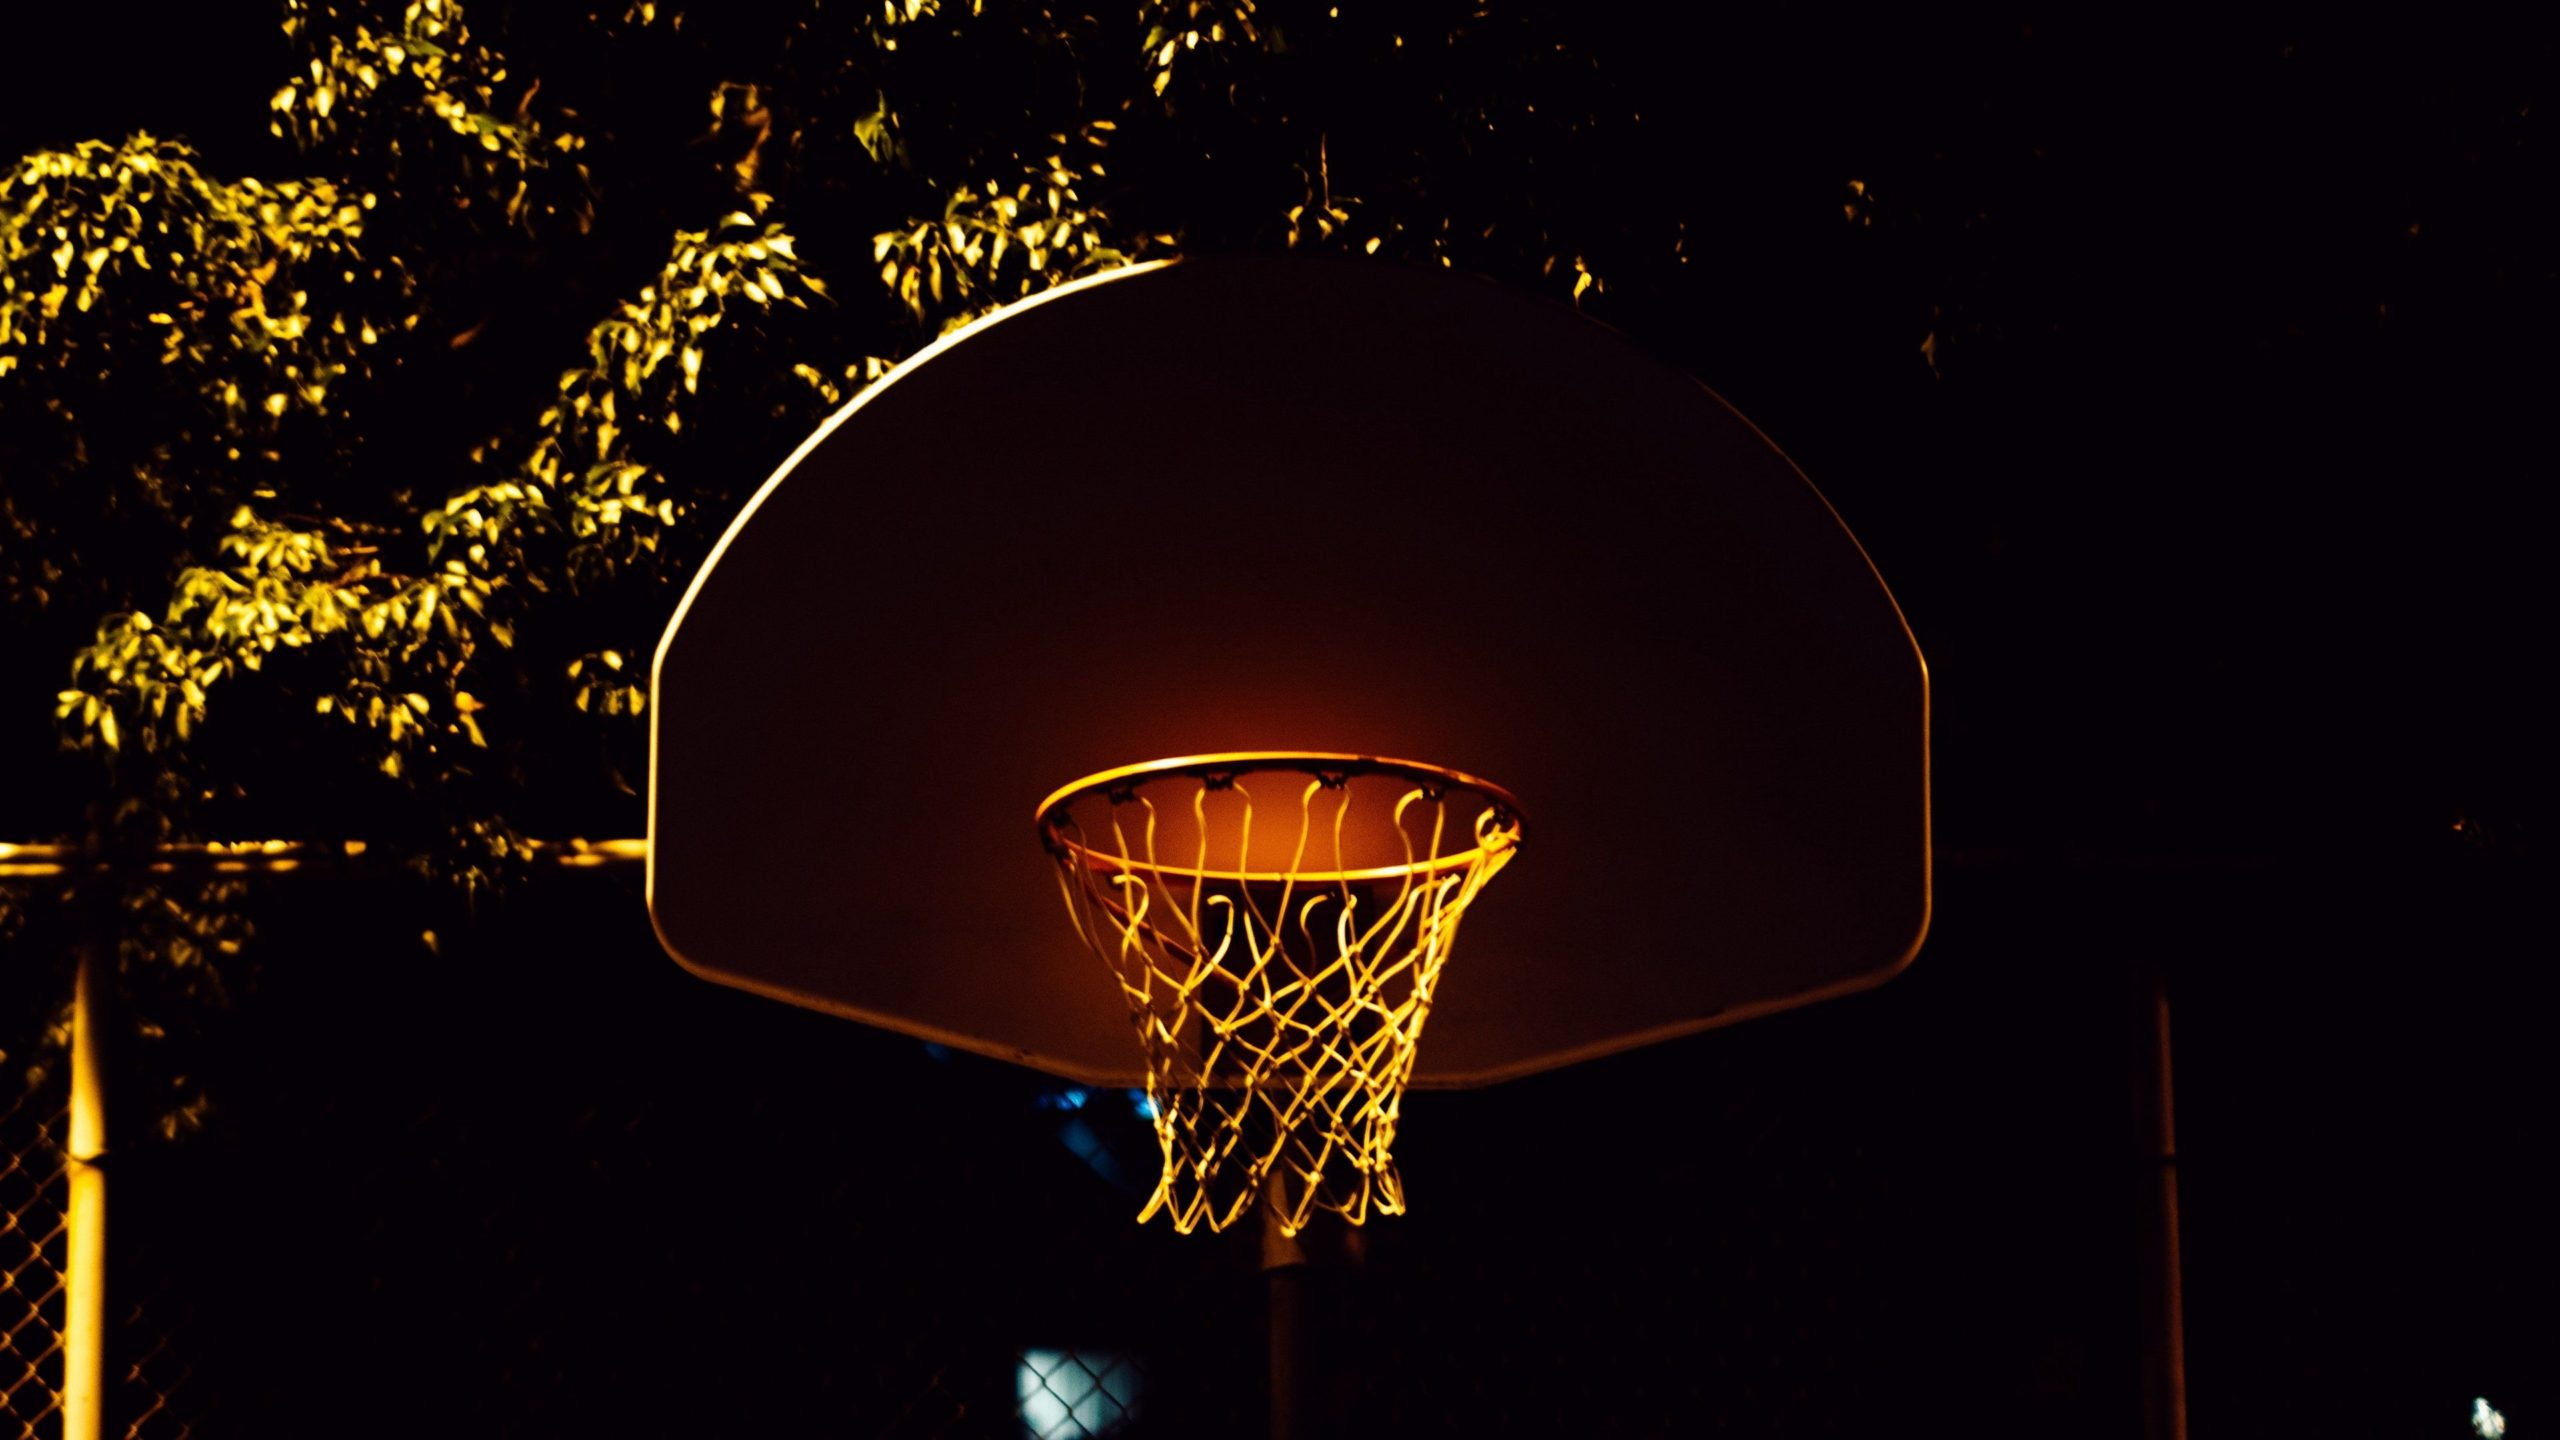 cool wallpapers basketball